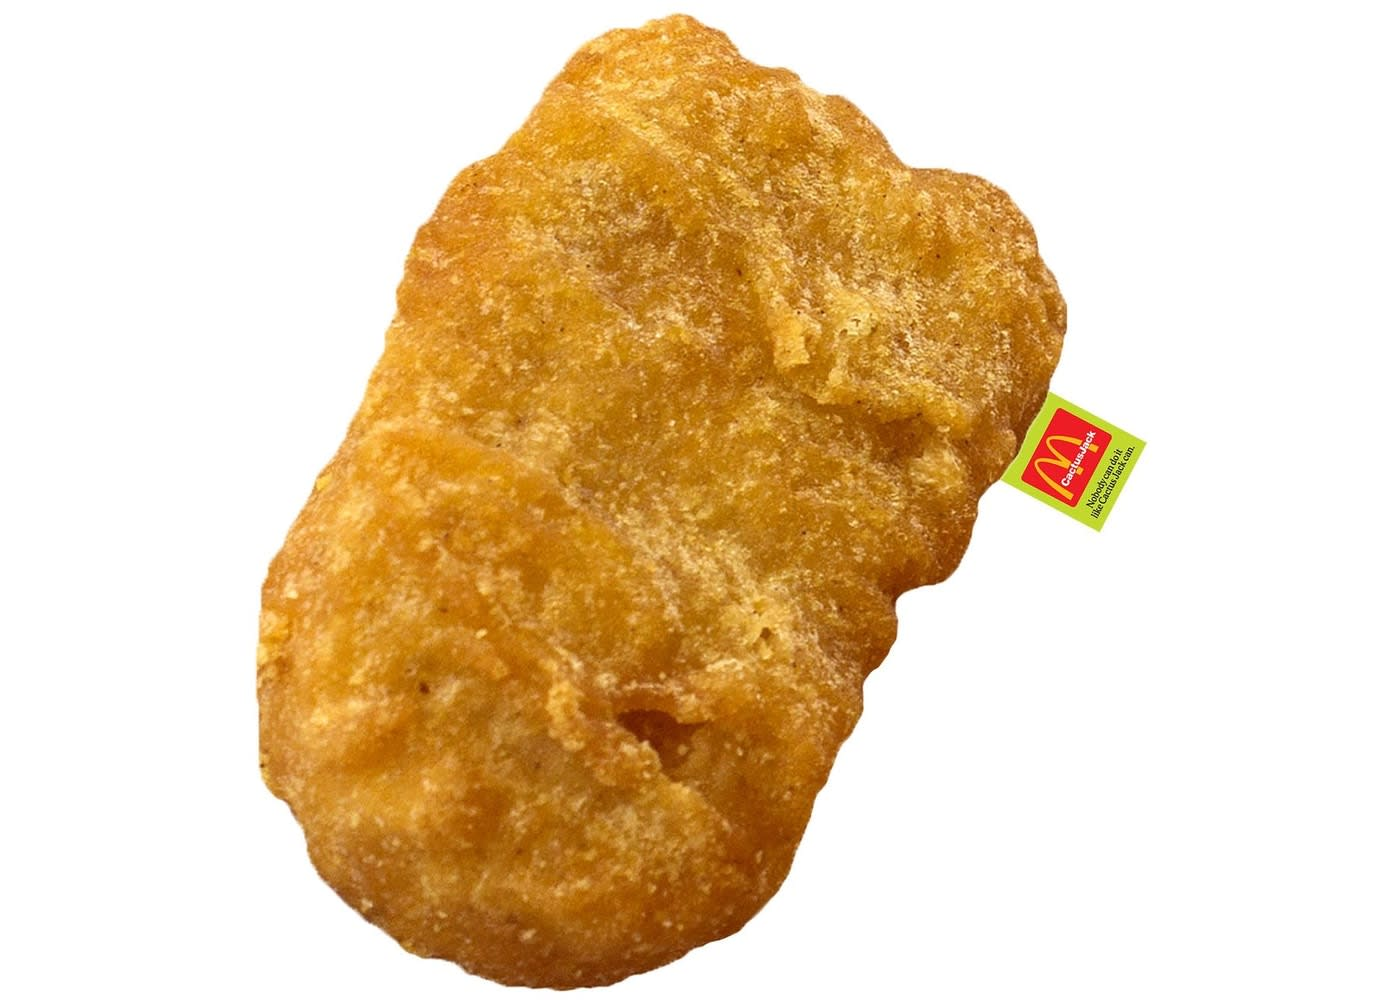 Travis Scott x McDonald's McNugget Body Pillow